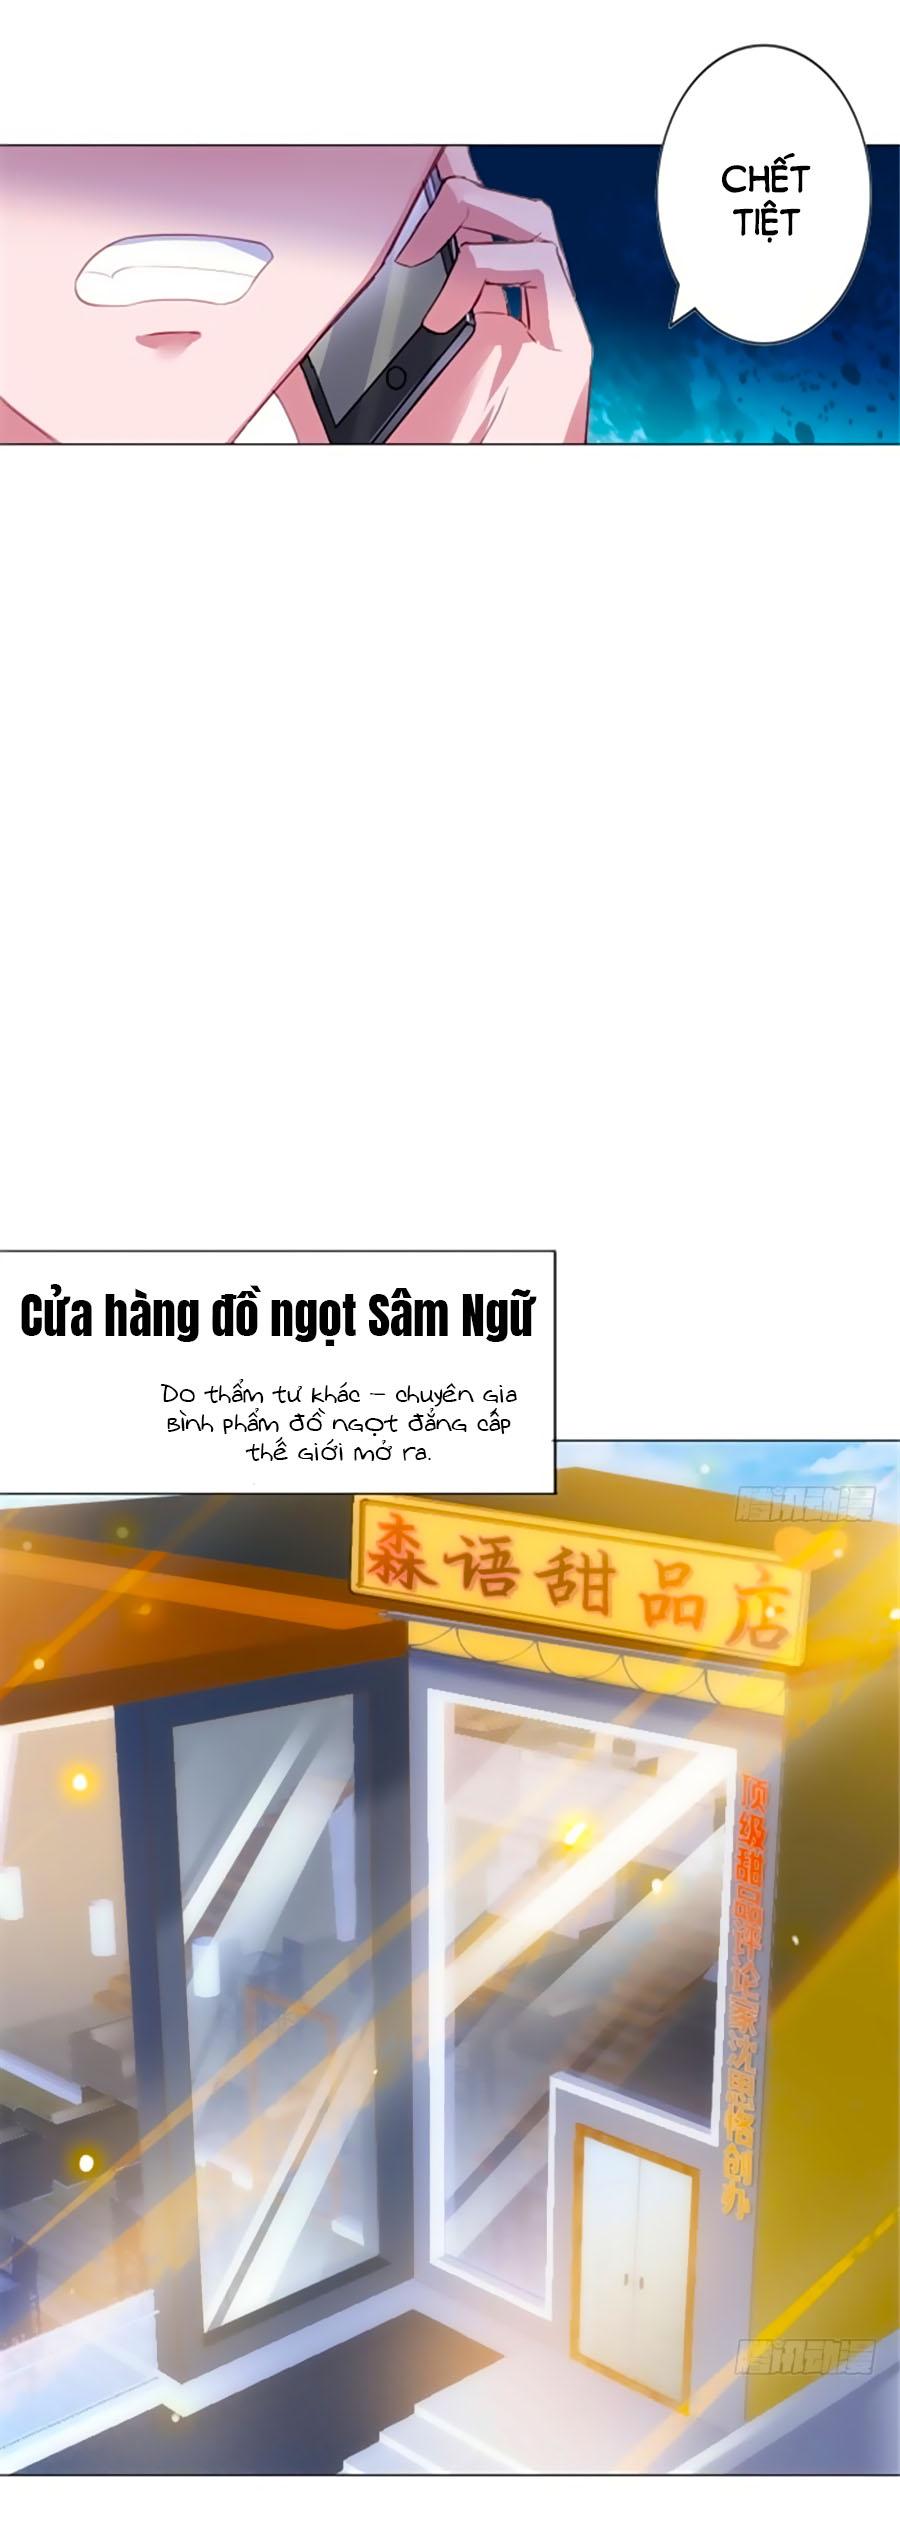 Sủng Hôn Lai Tập Chap 6 - Next Chap 7